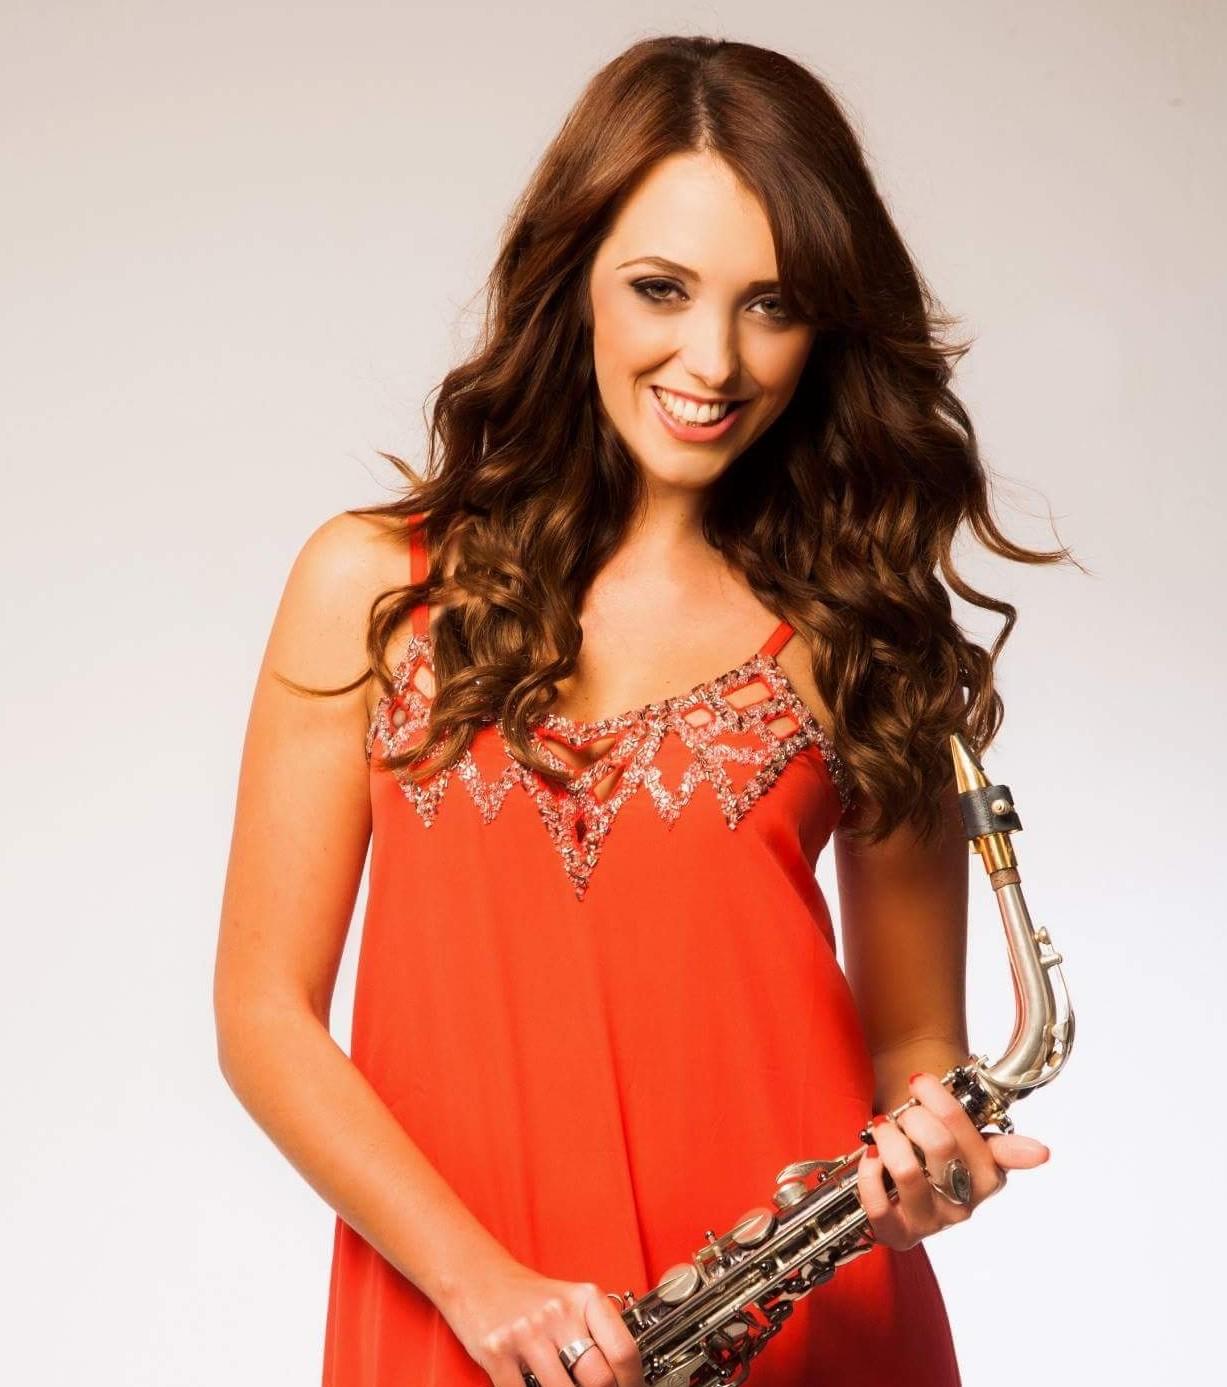 Saxophone image